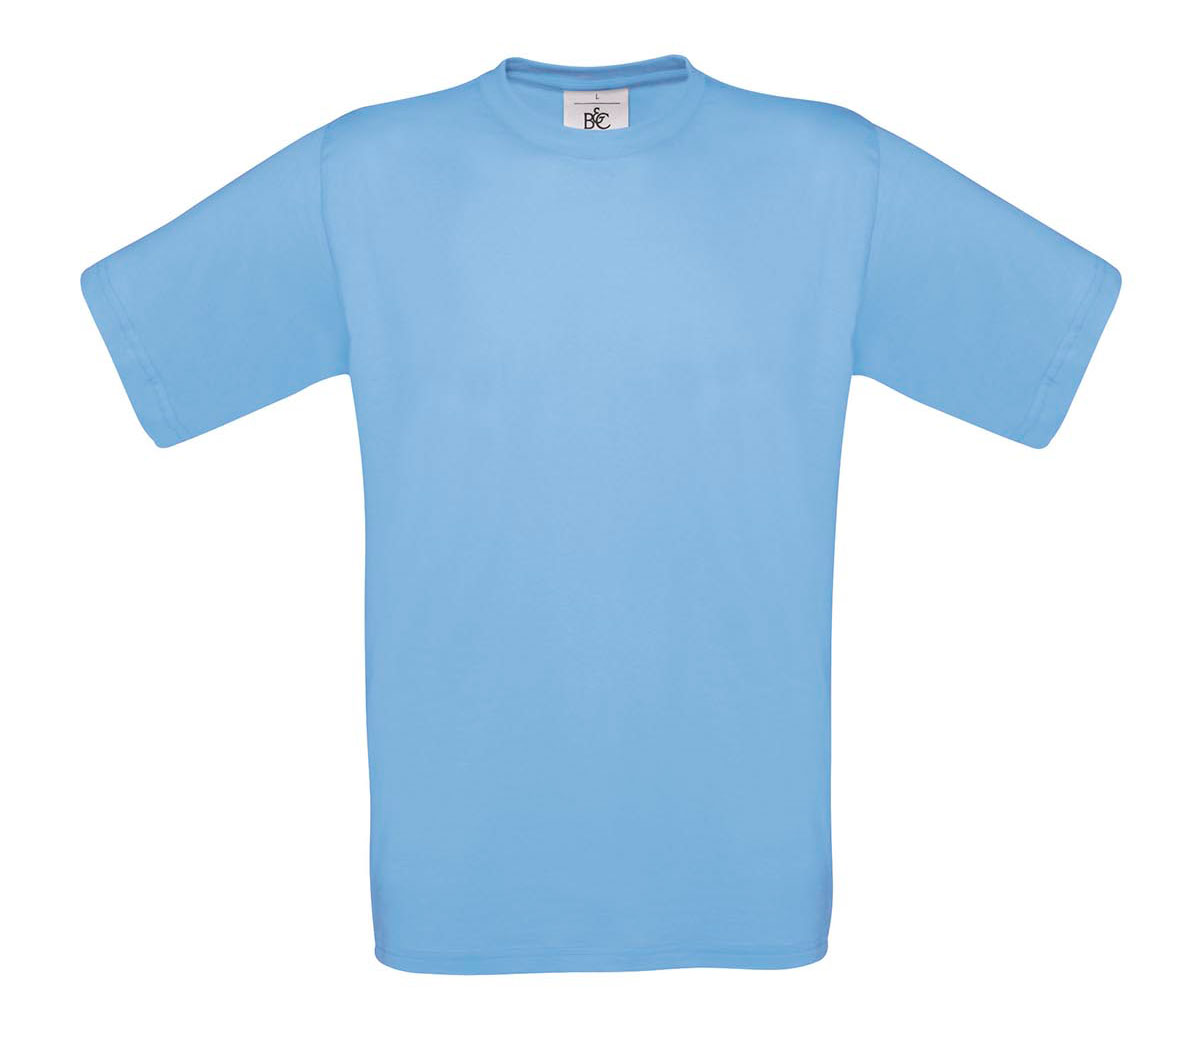 T-shirt ανδρικό B and C No 2 - Γαλάζιο (TU002)